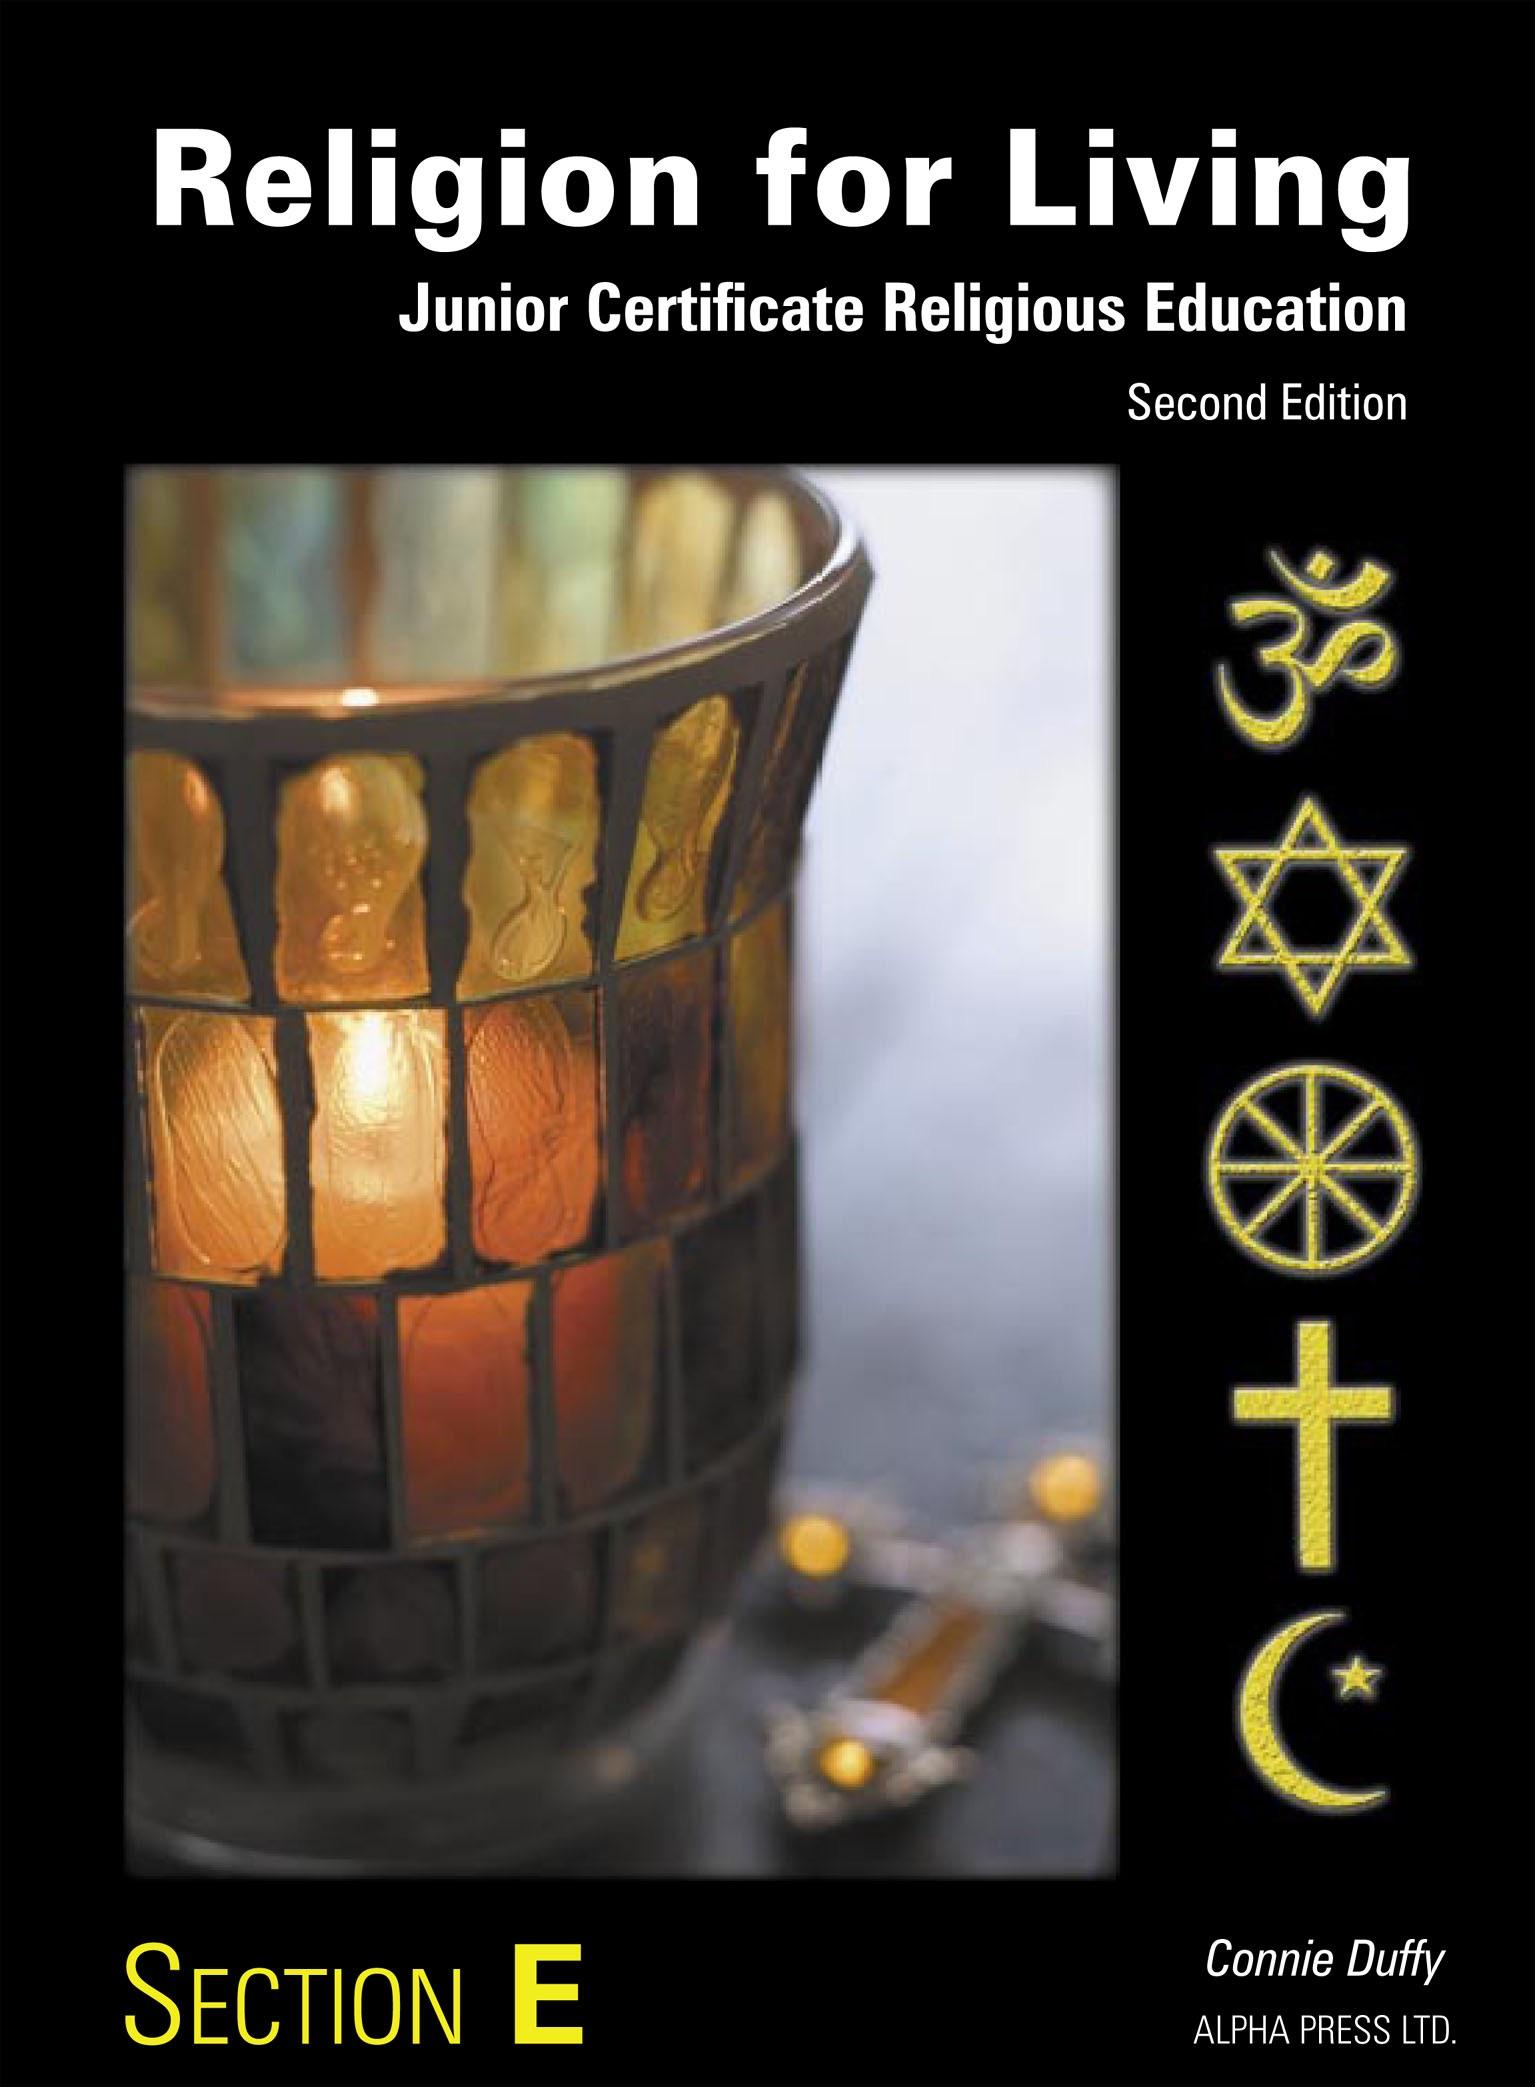 Leaving Certificate Religious Education